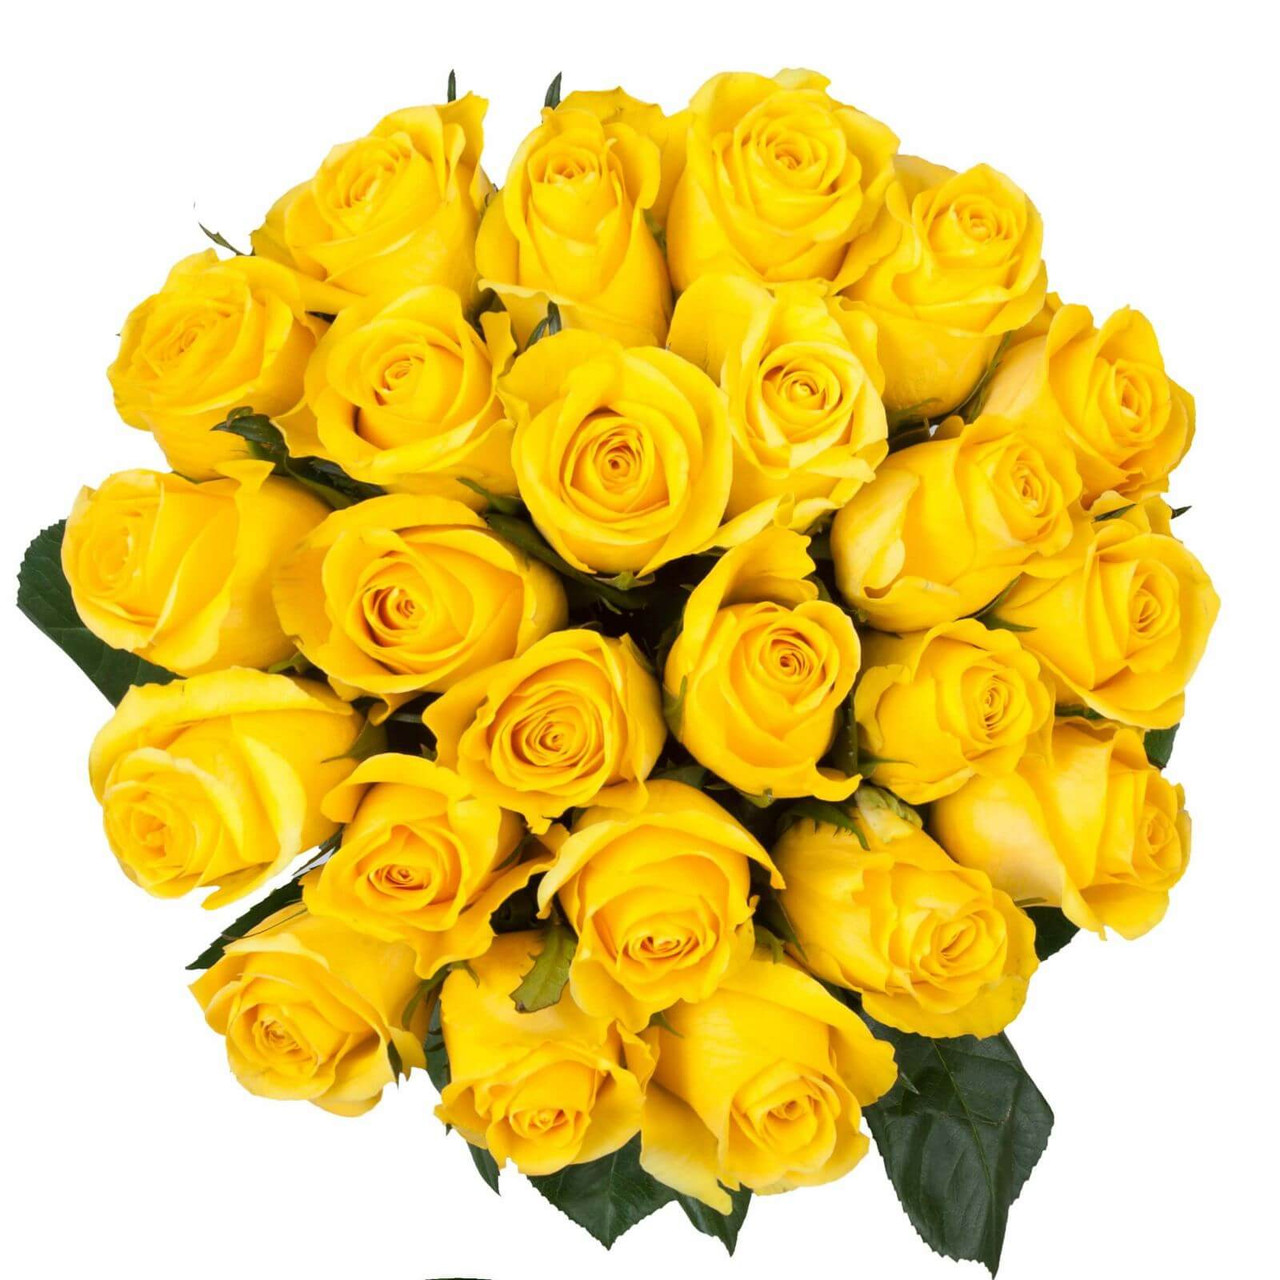 24 Yellow Ecuadorian Roses